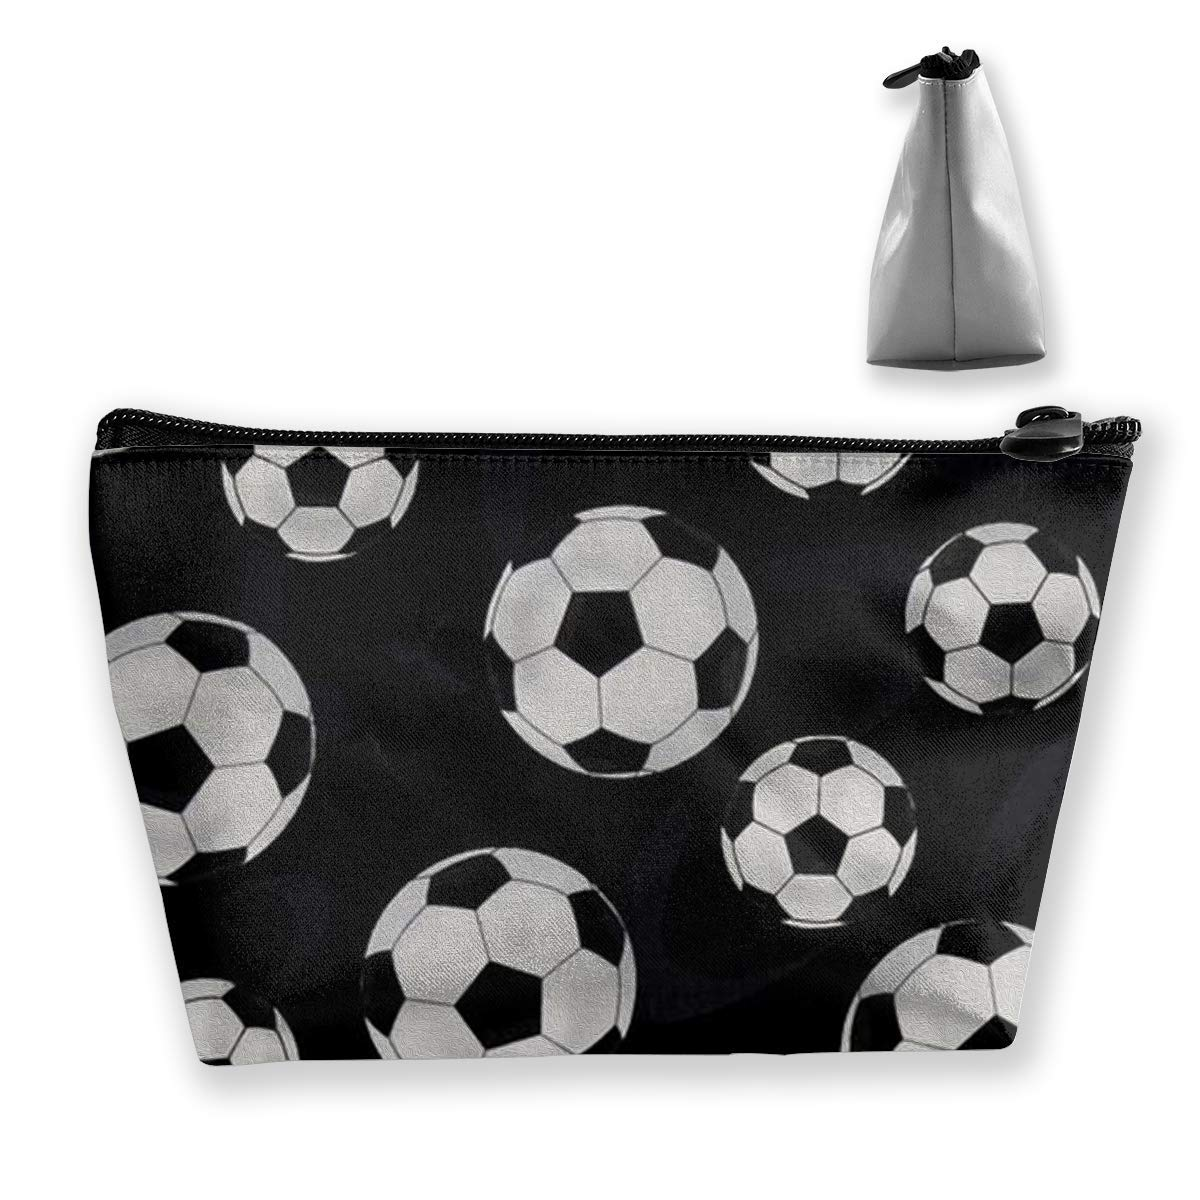 f67f24b9fb3e Amazon.com : Football Cosmetic Bag Travel Makeup Bag Portable ...